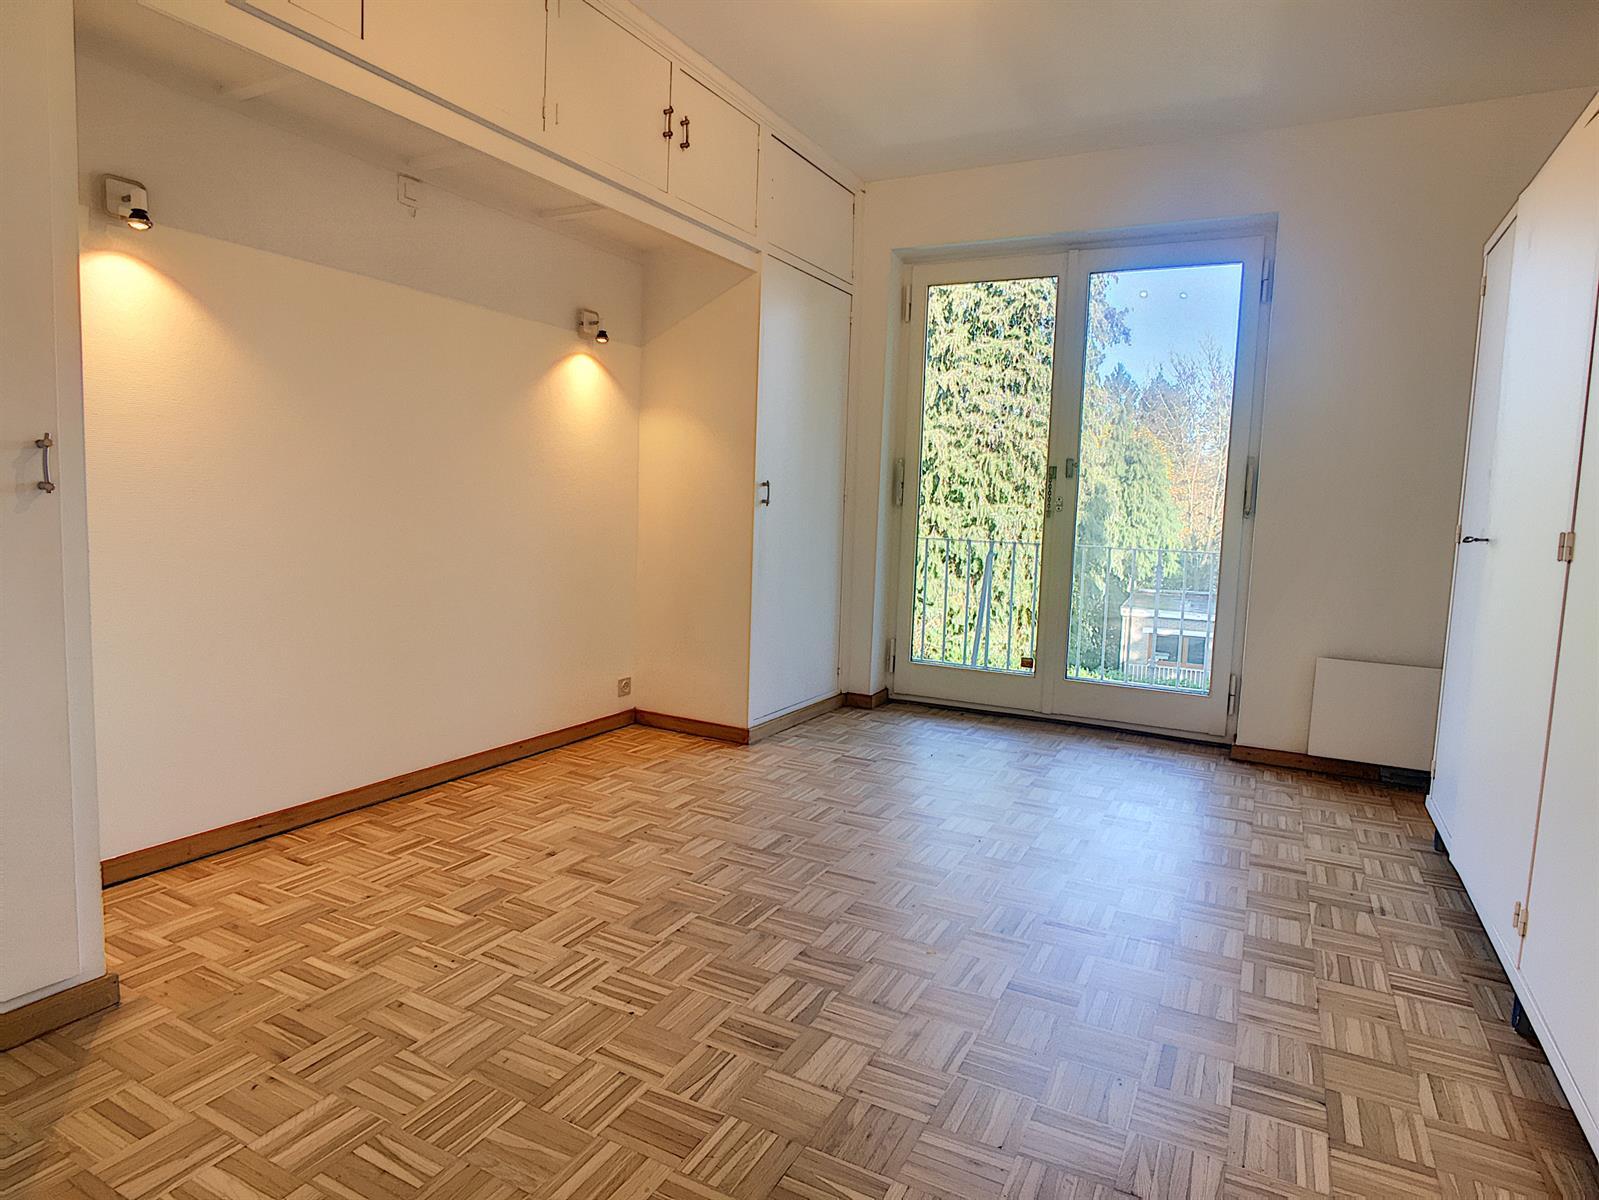 Flat - Auderghem - #4197560-7